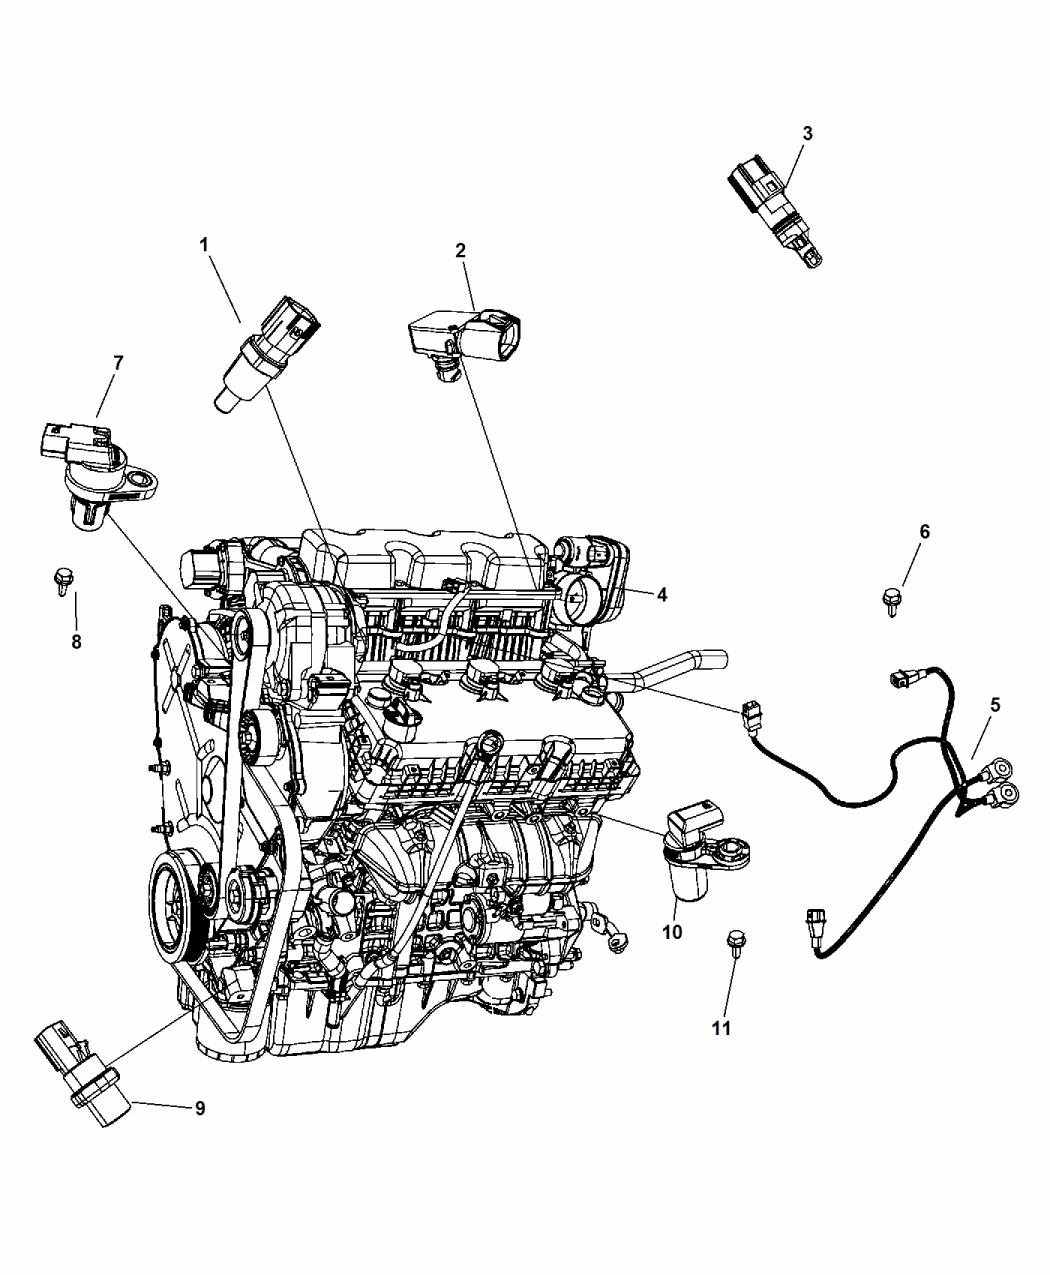 ZT_7228] Dodge Journey 3 5 Engine Wire Diagram Wiring Diagramnekout.peted.kesian.illuminateatx.org